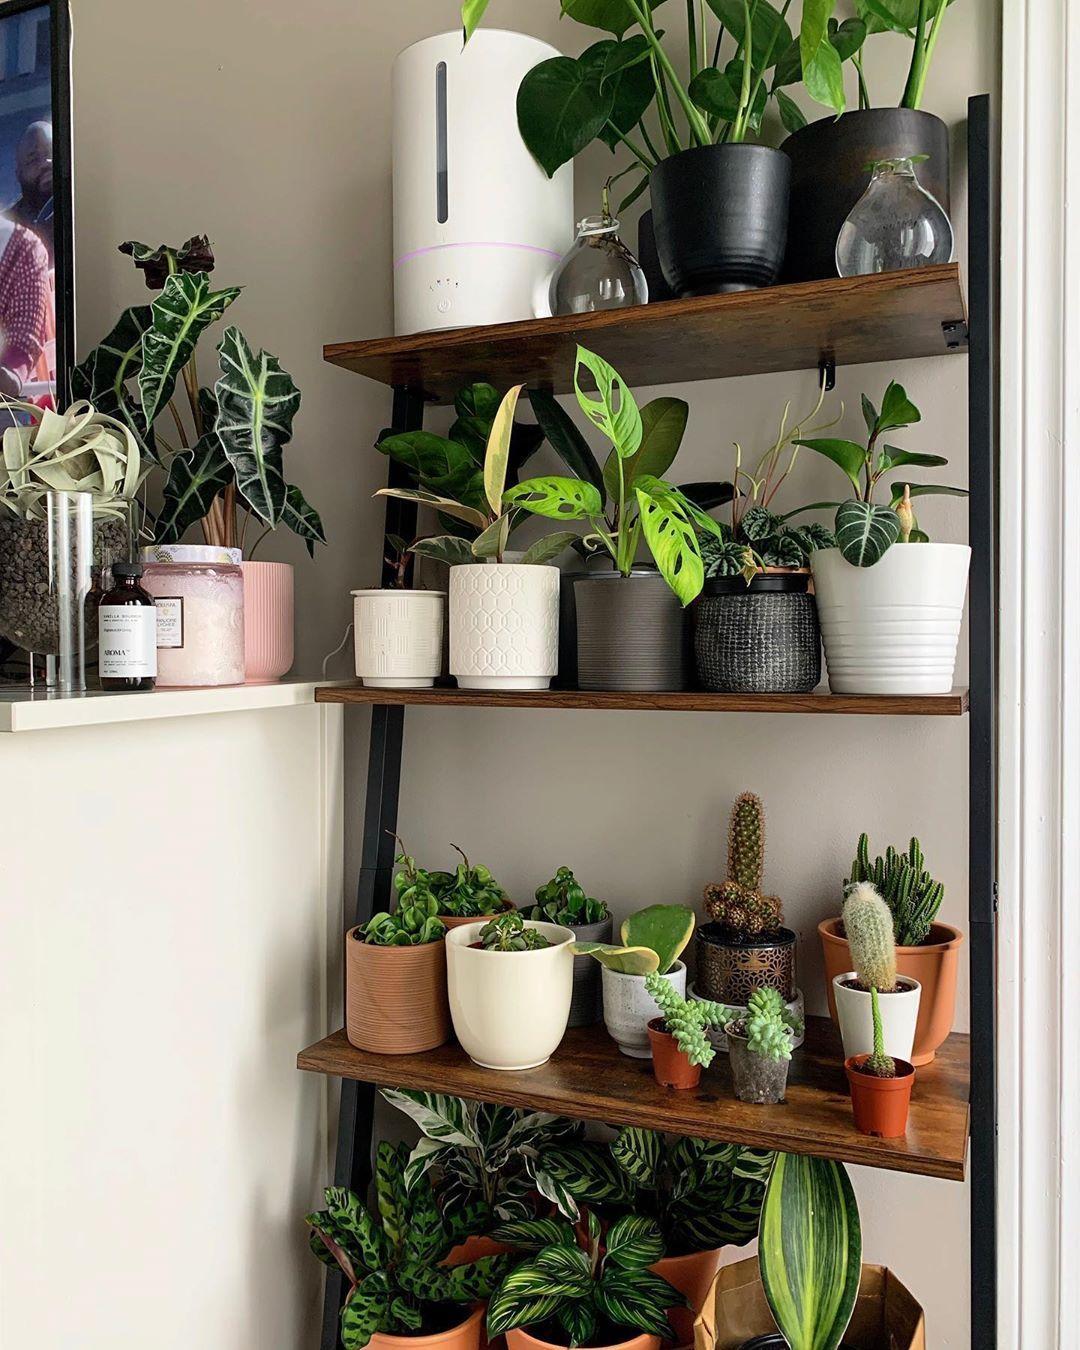 4 Tiers Wall Shelf Ladder Shelf in 2020 Plant decor